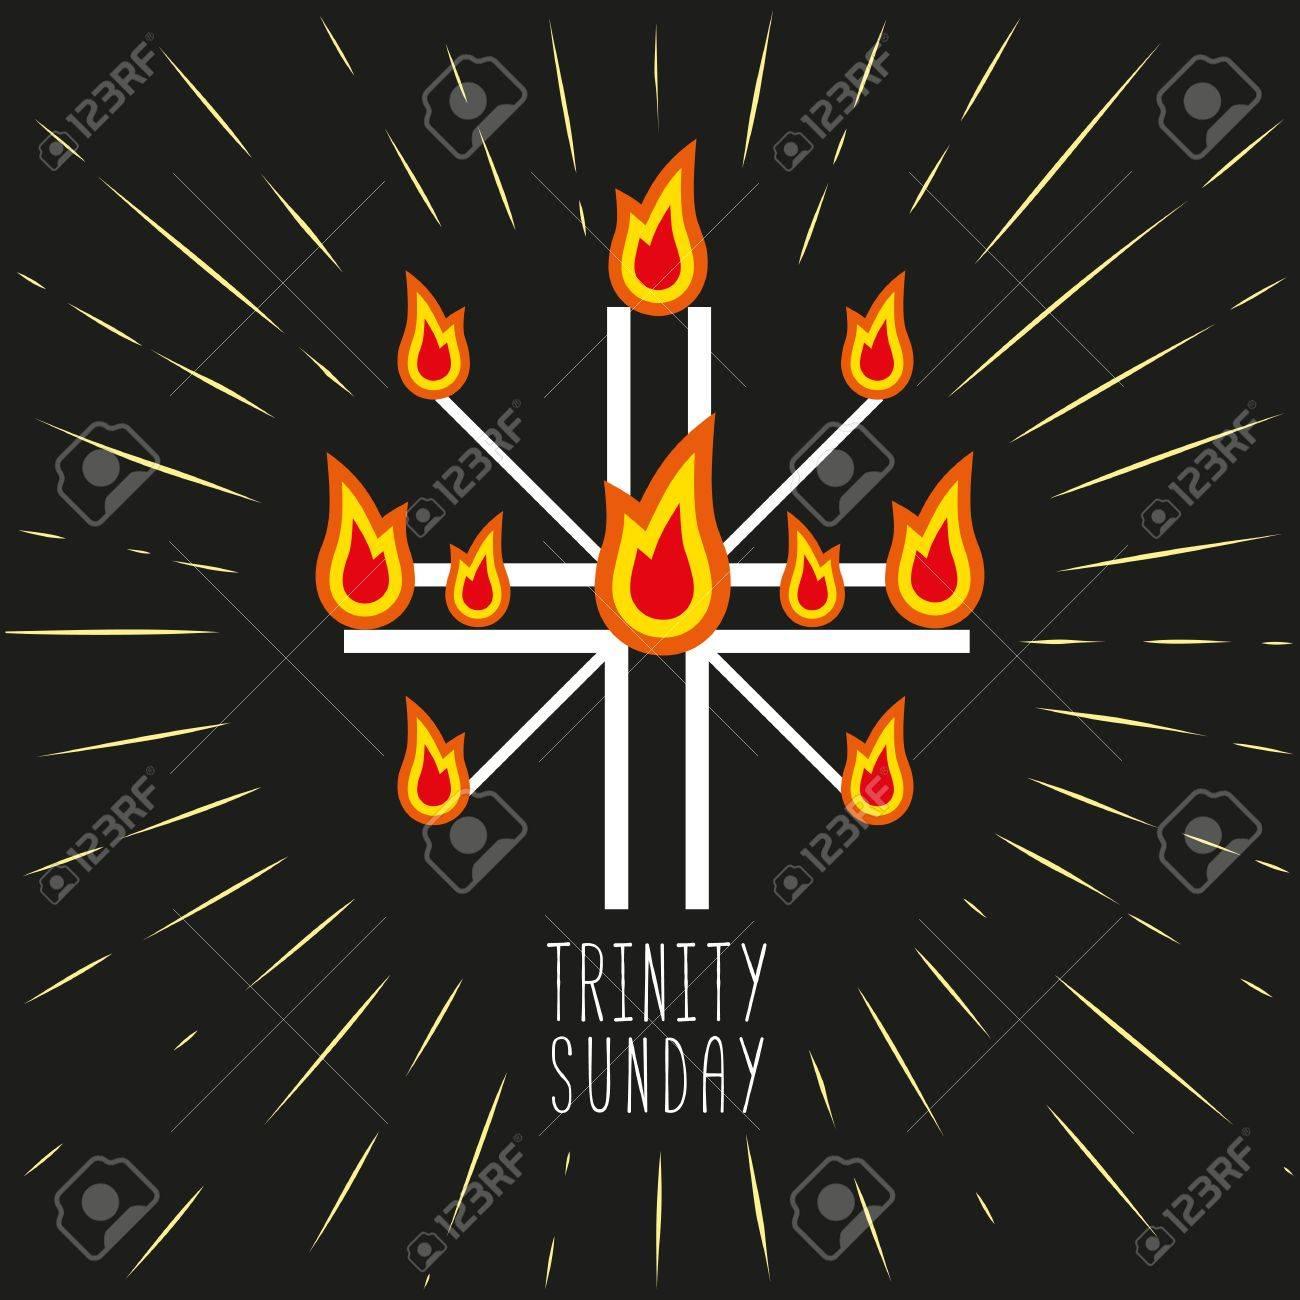 Church Symbols Christian Holiday Concept Holy Spirit Jesus